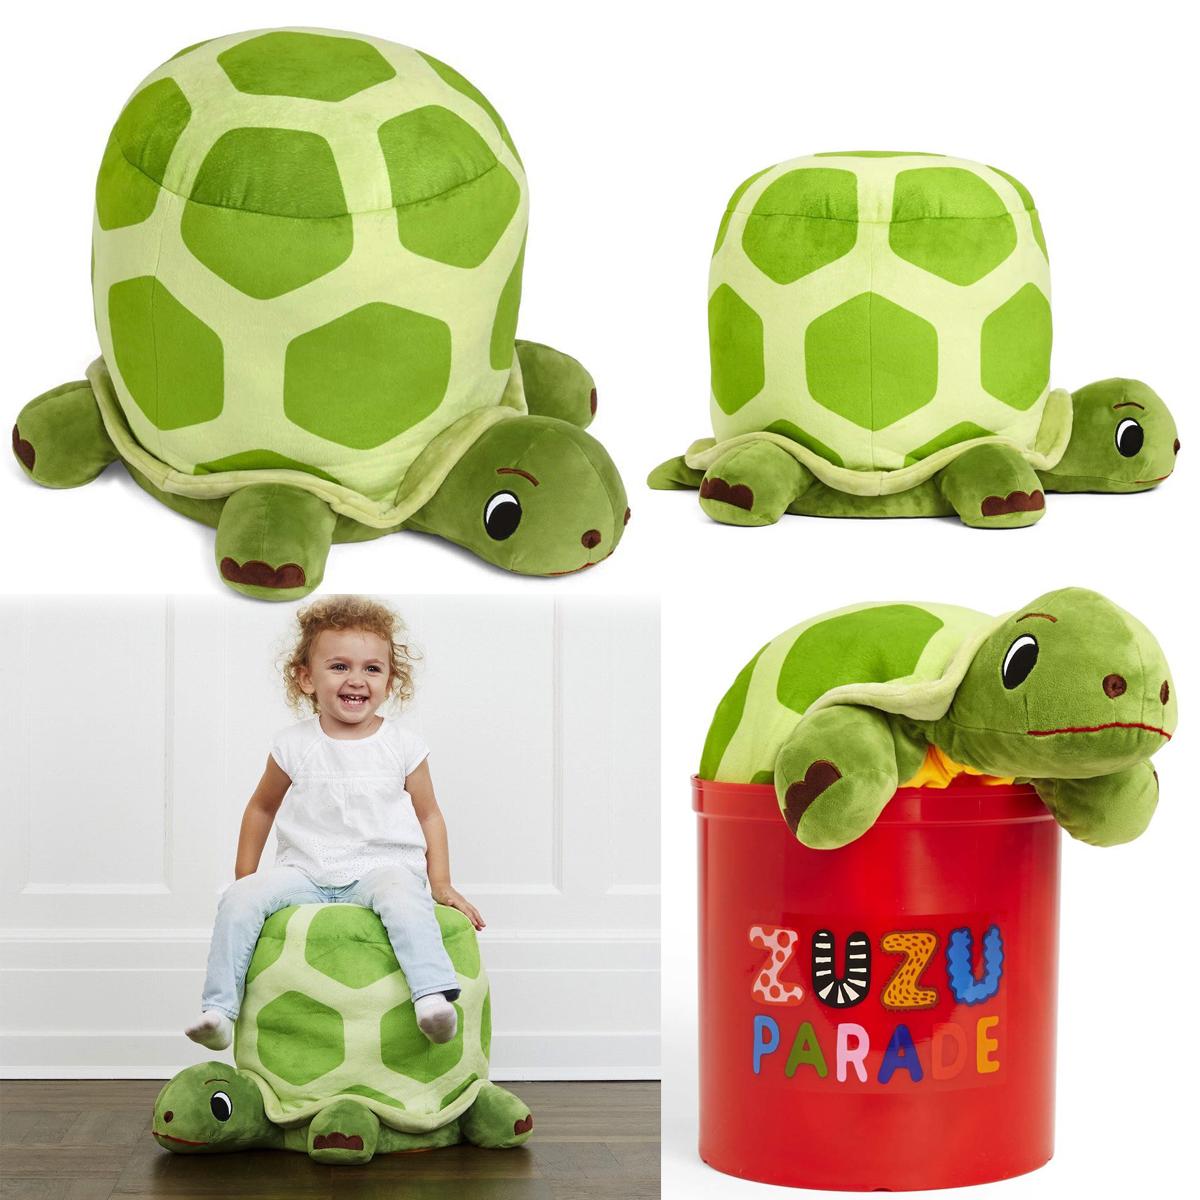 Zuzu Parade Stuffed Animal Kids Chair Playroom Toy